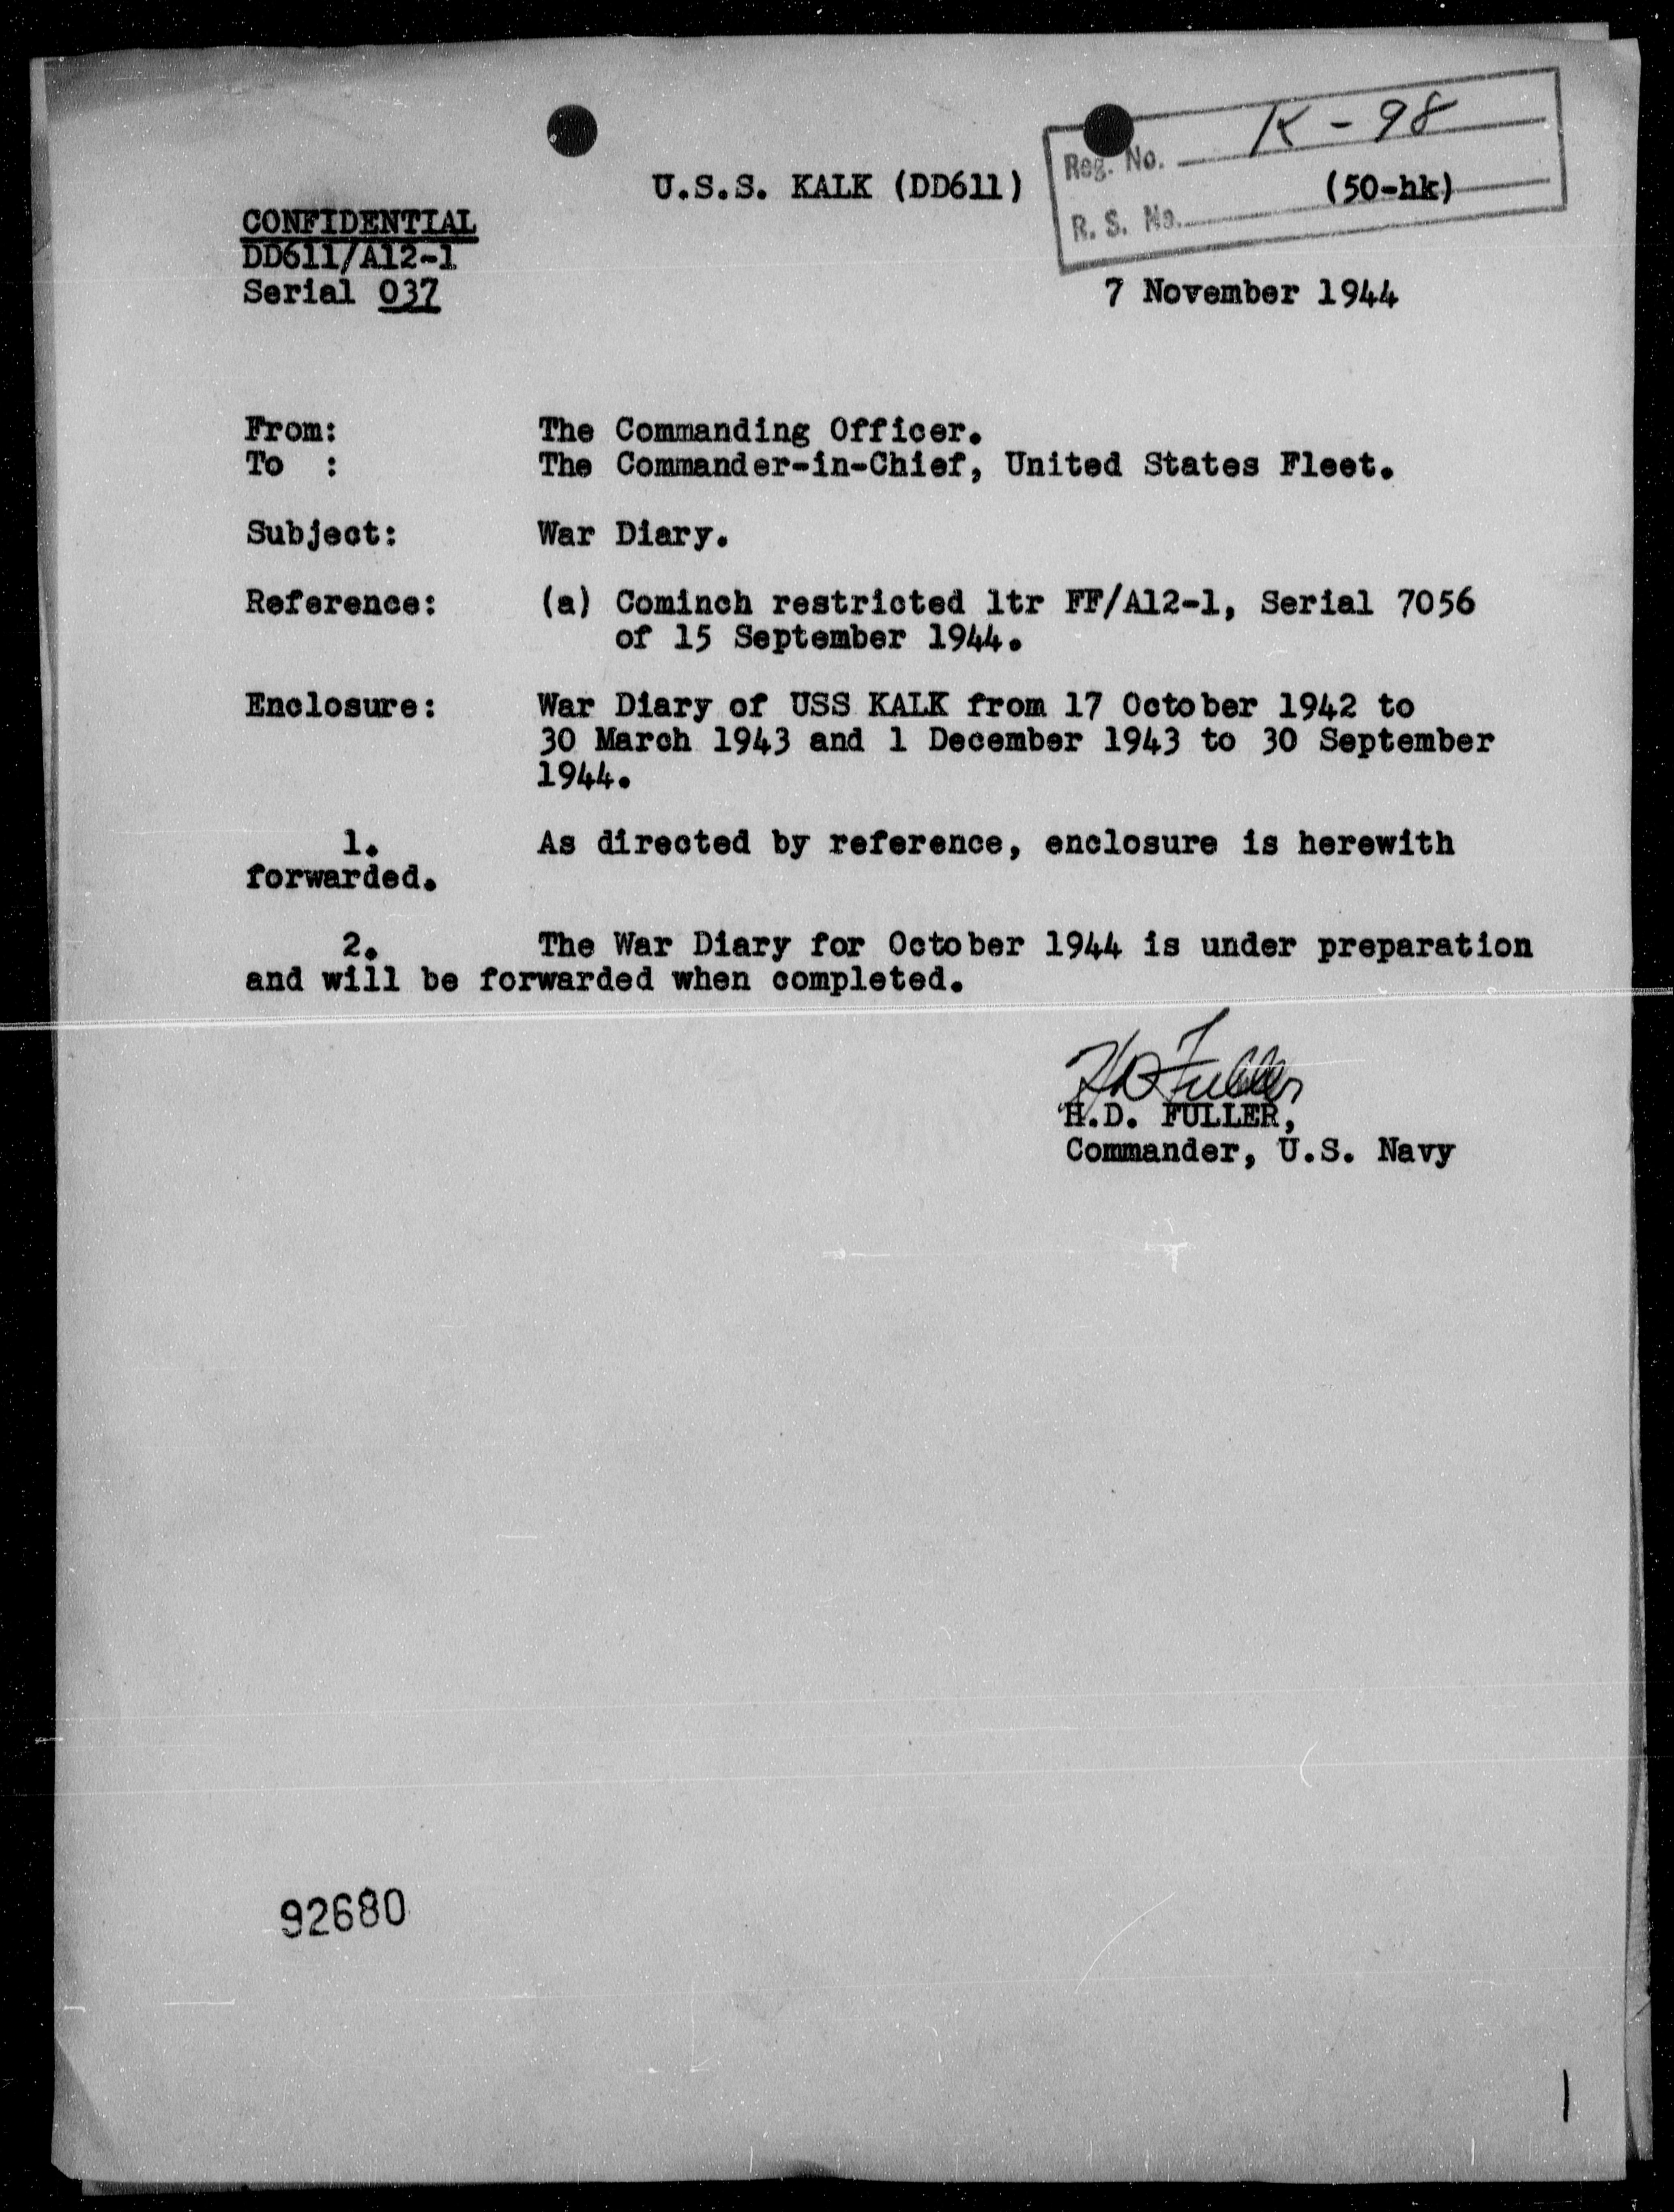 USS KALK - War Diary, 10/17/42 to 3/31/43